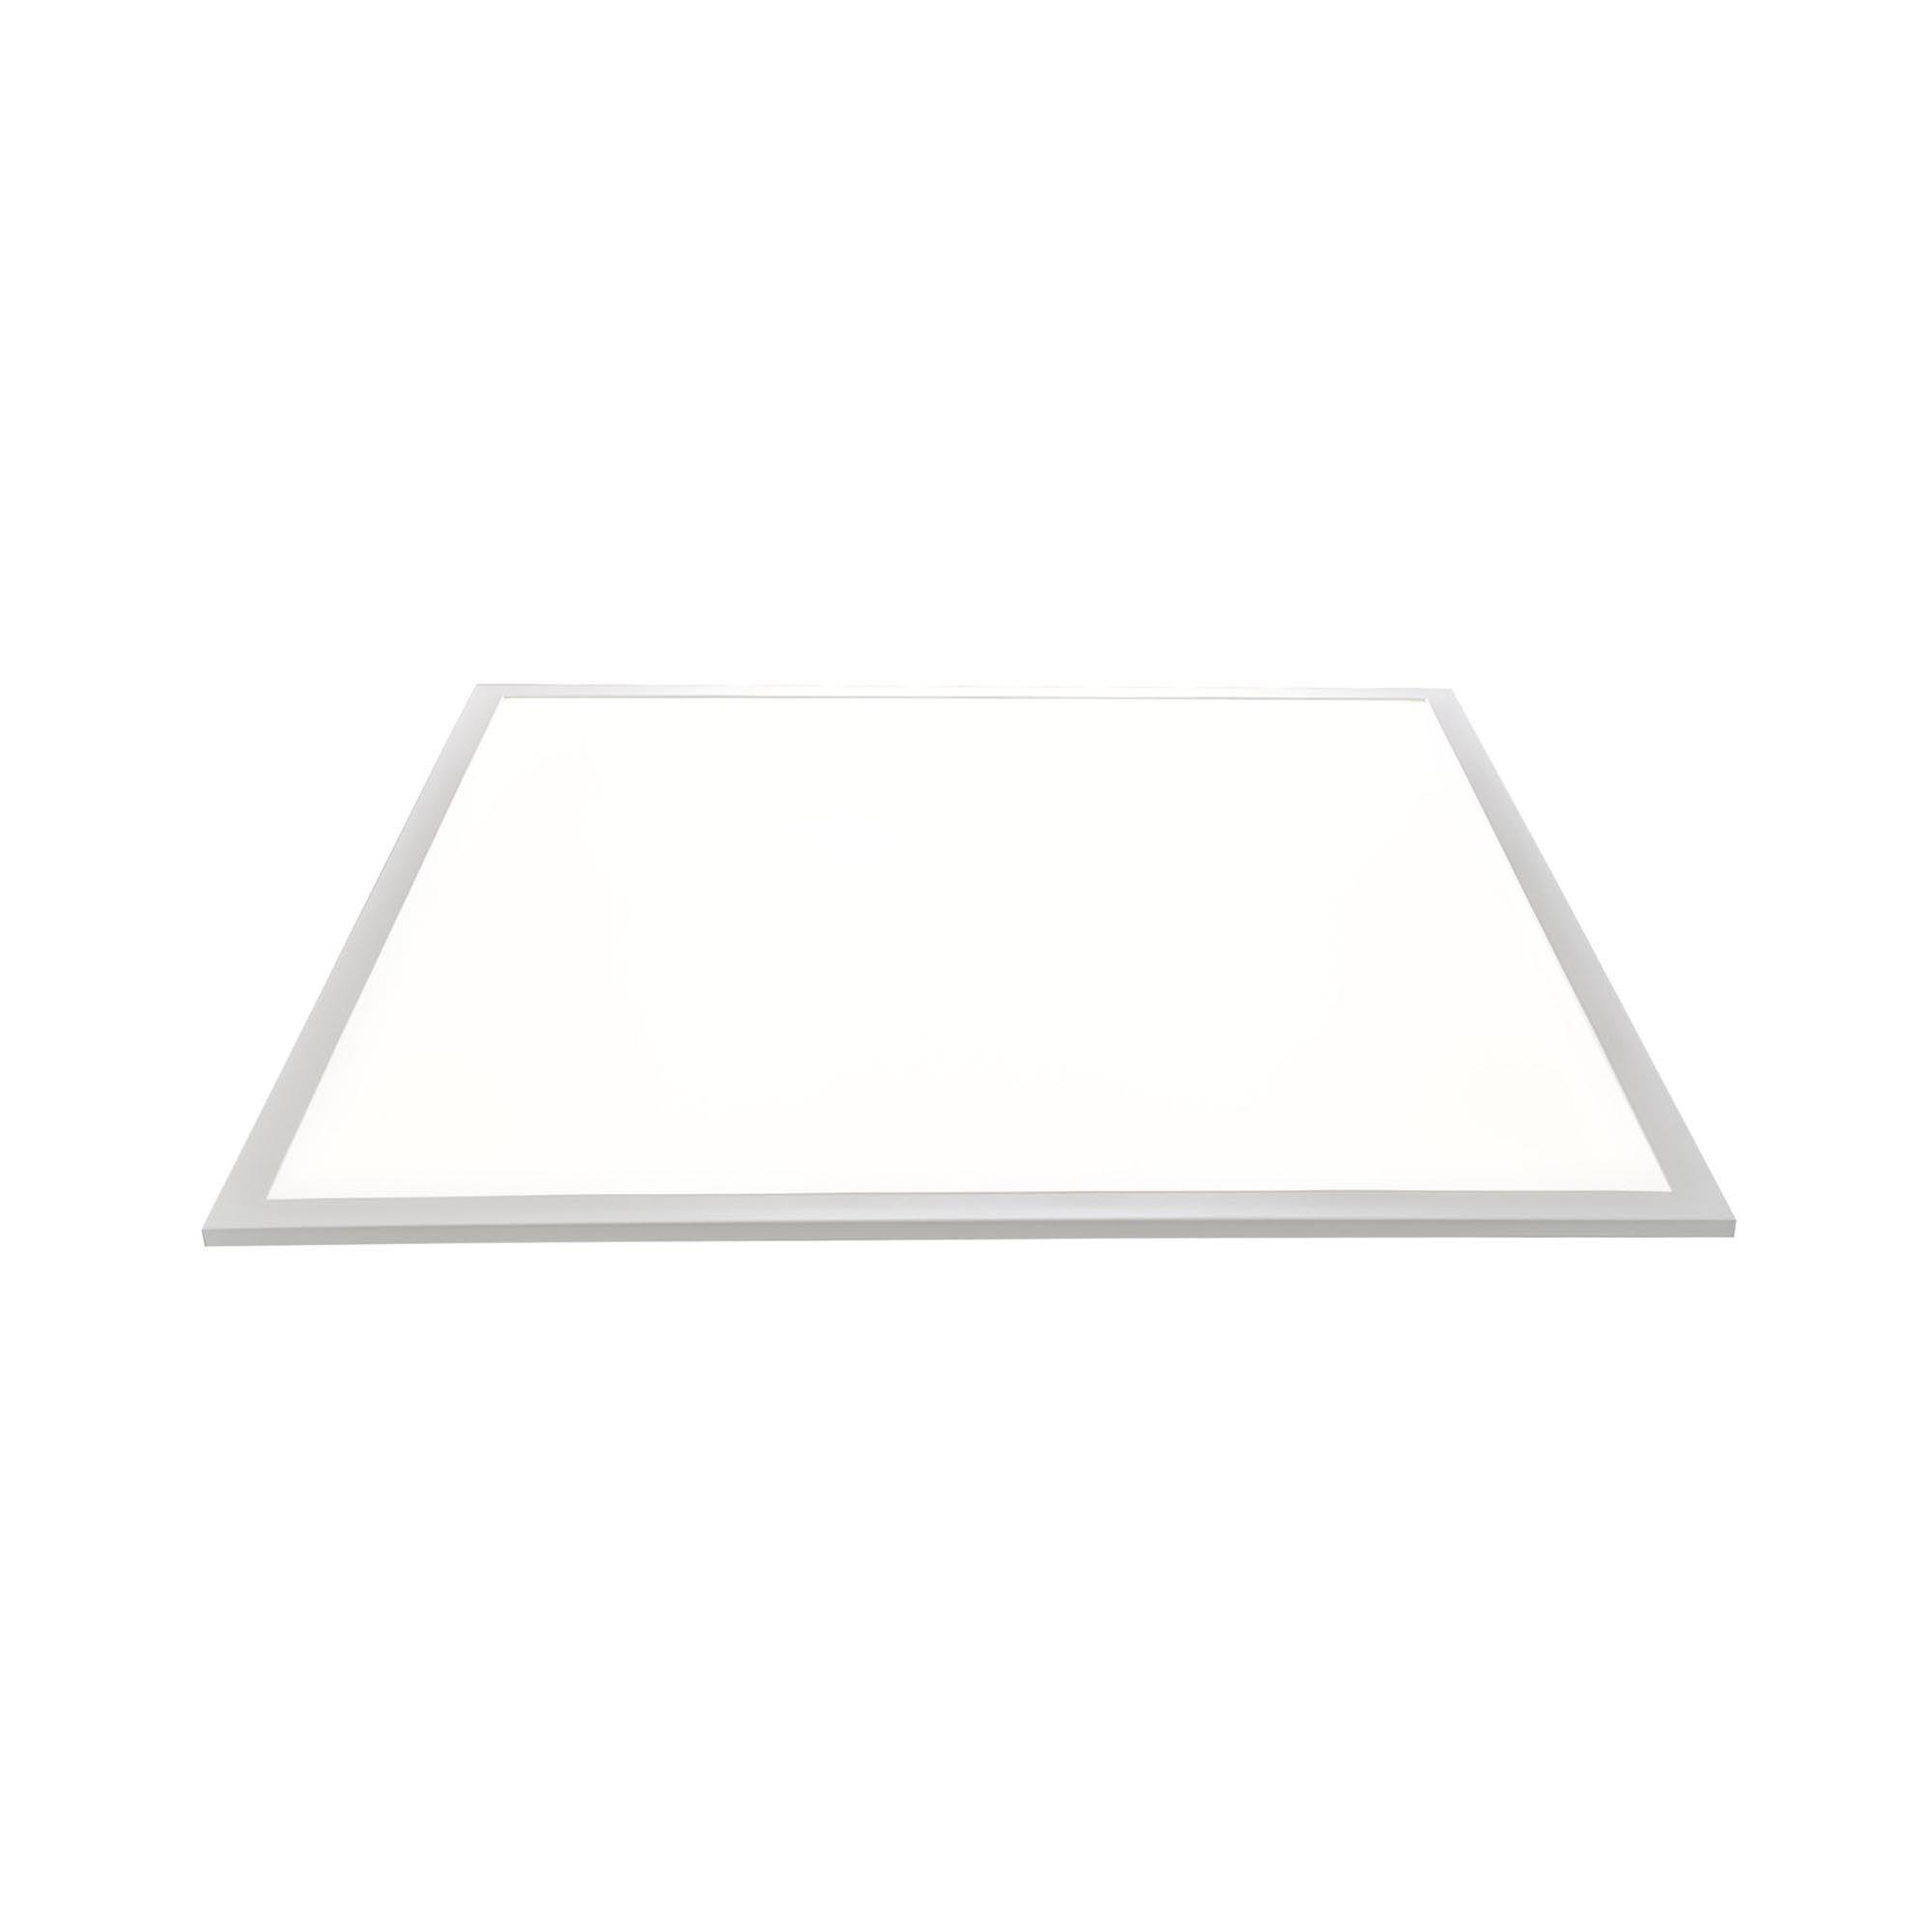 HEITRONIC LED-panel tak - 40 W - 4,000 lumen